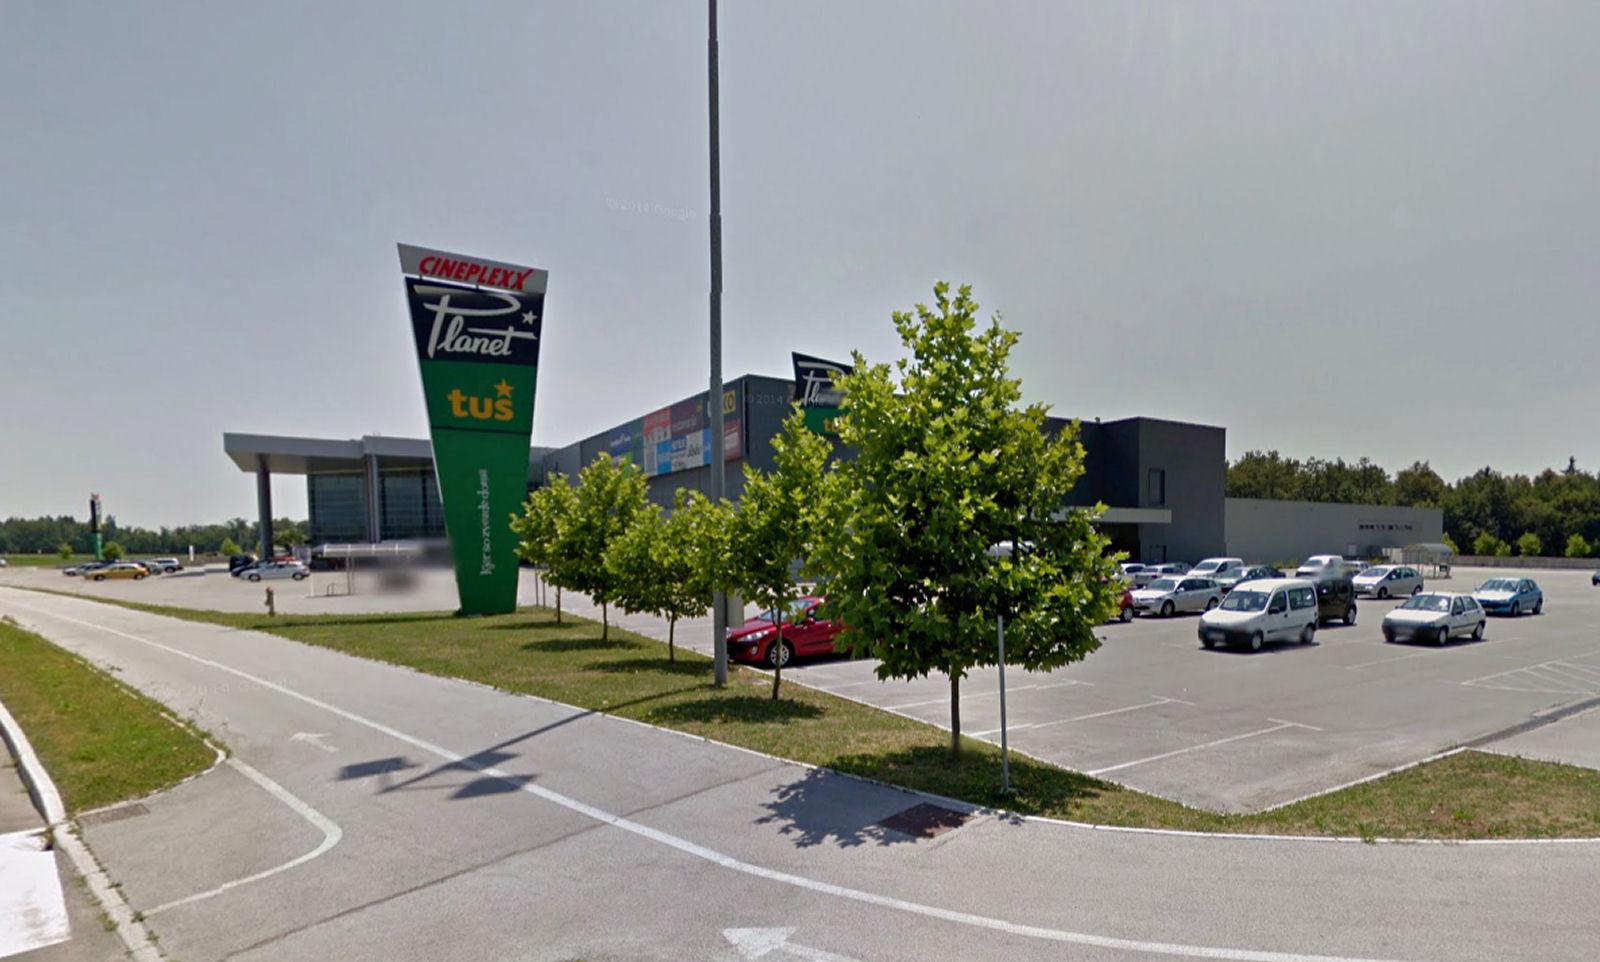 Planet TUS Kranj shopping centre